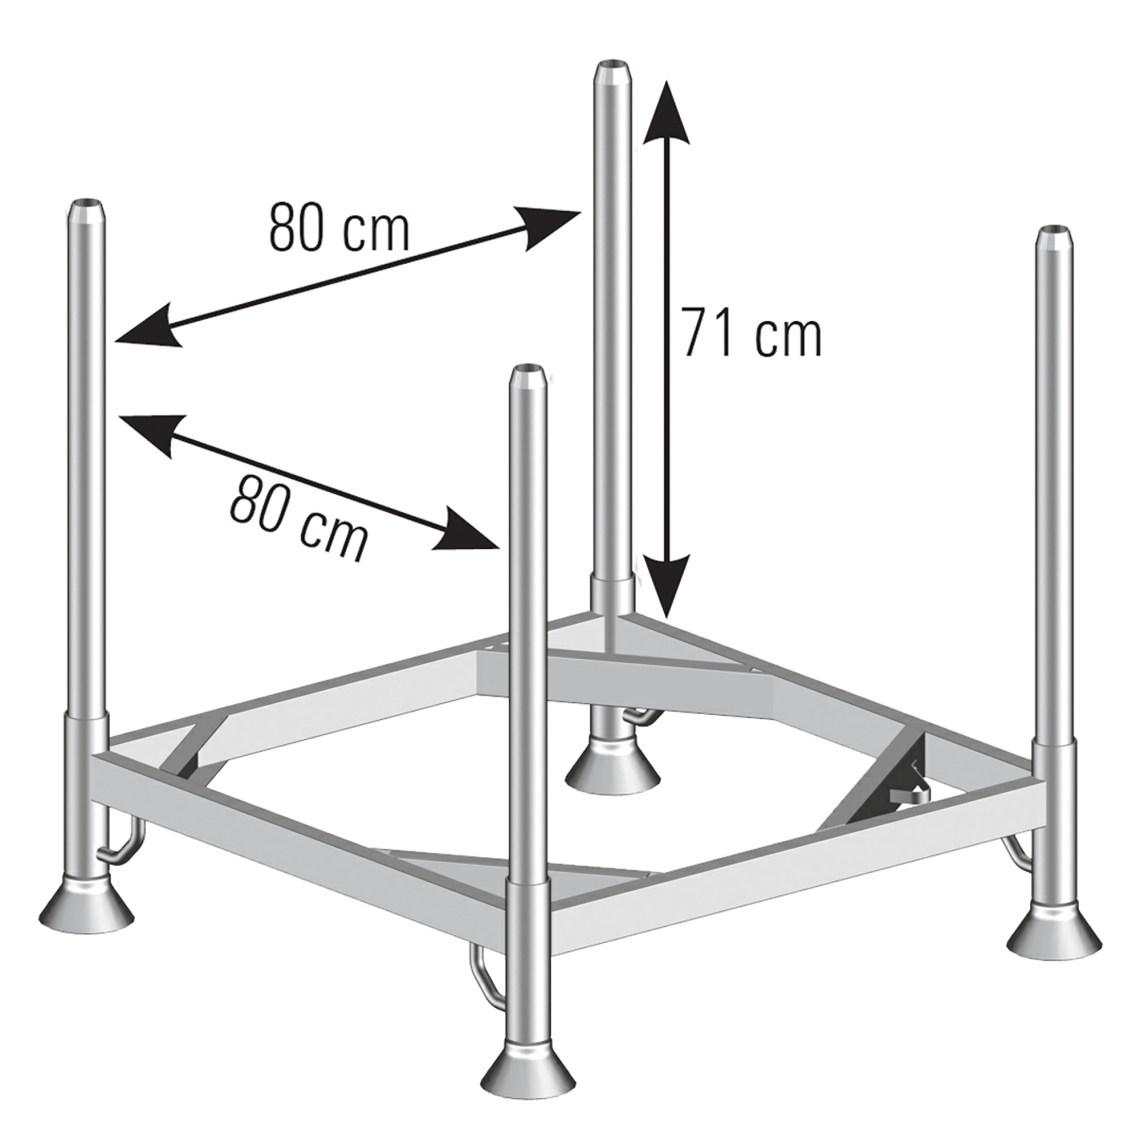 Scaffolding tube pallet